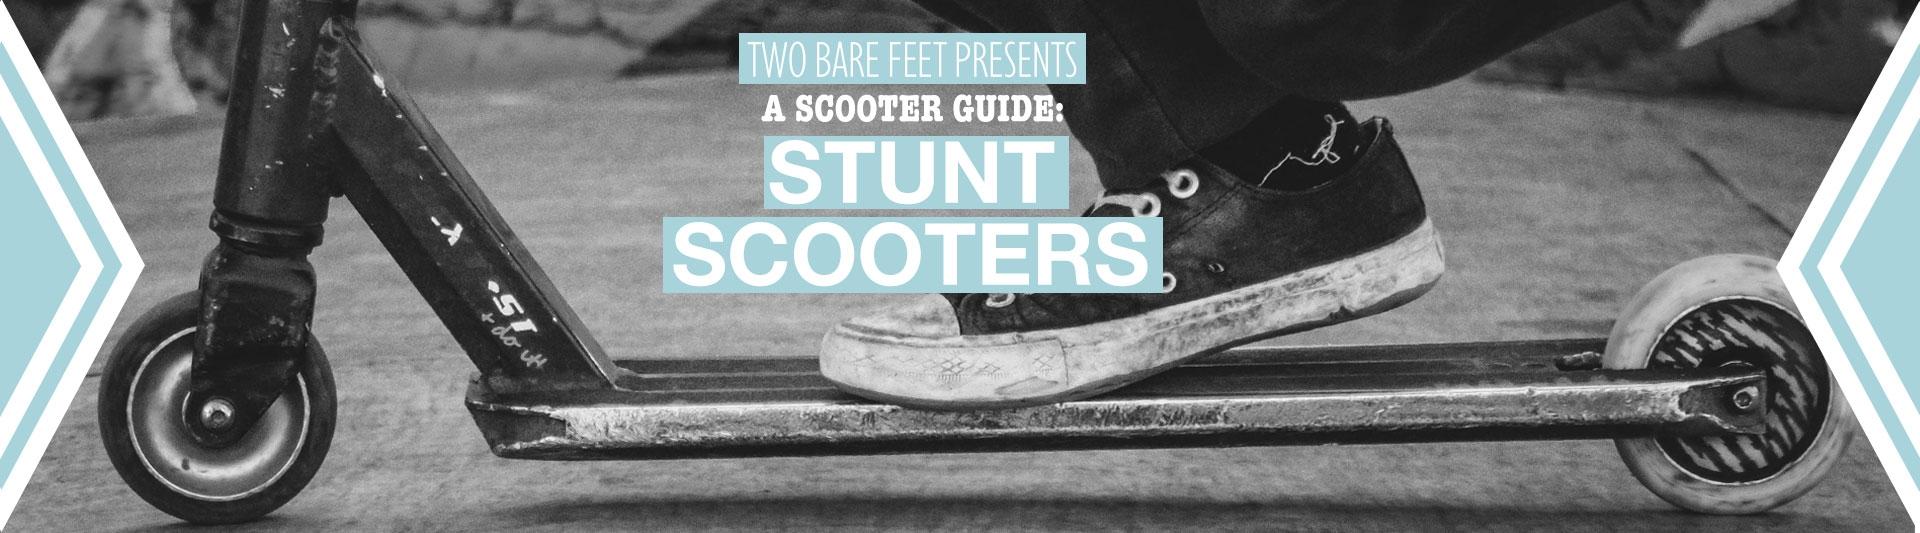 Stunt scooter banner